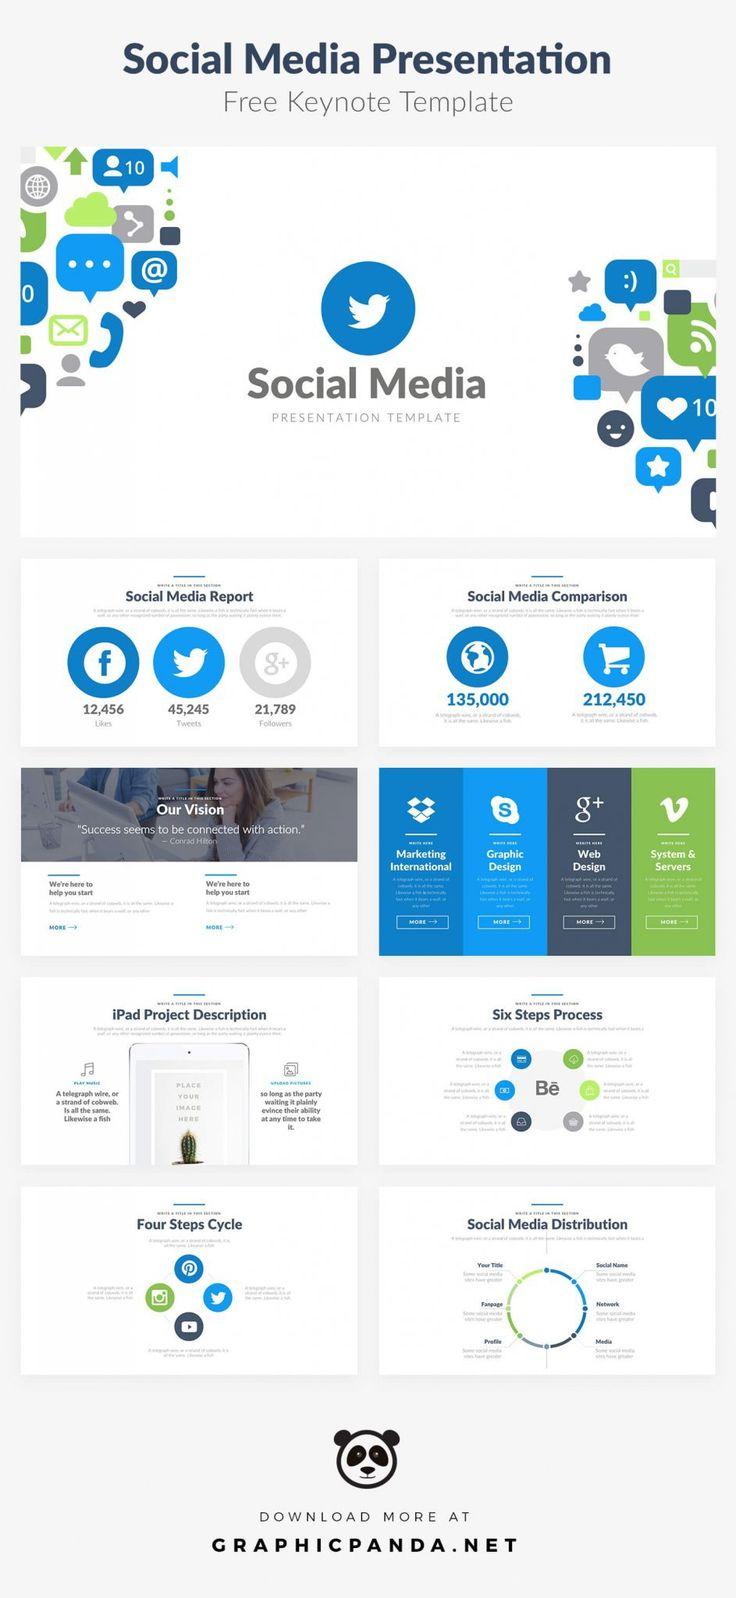 11 best Free Keynote Templates Graphicpanda images on Pinterest ...